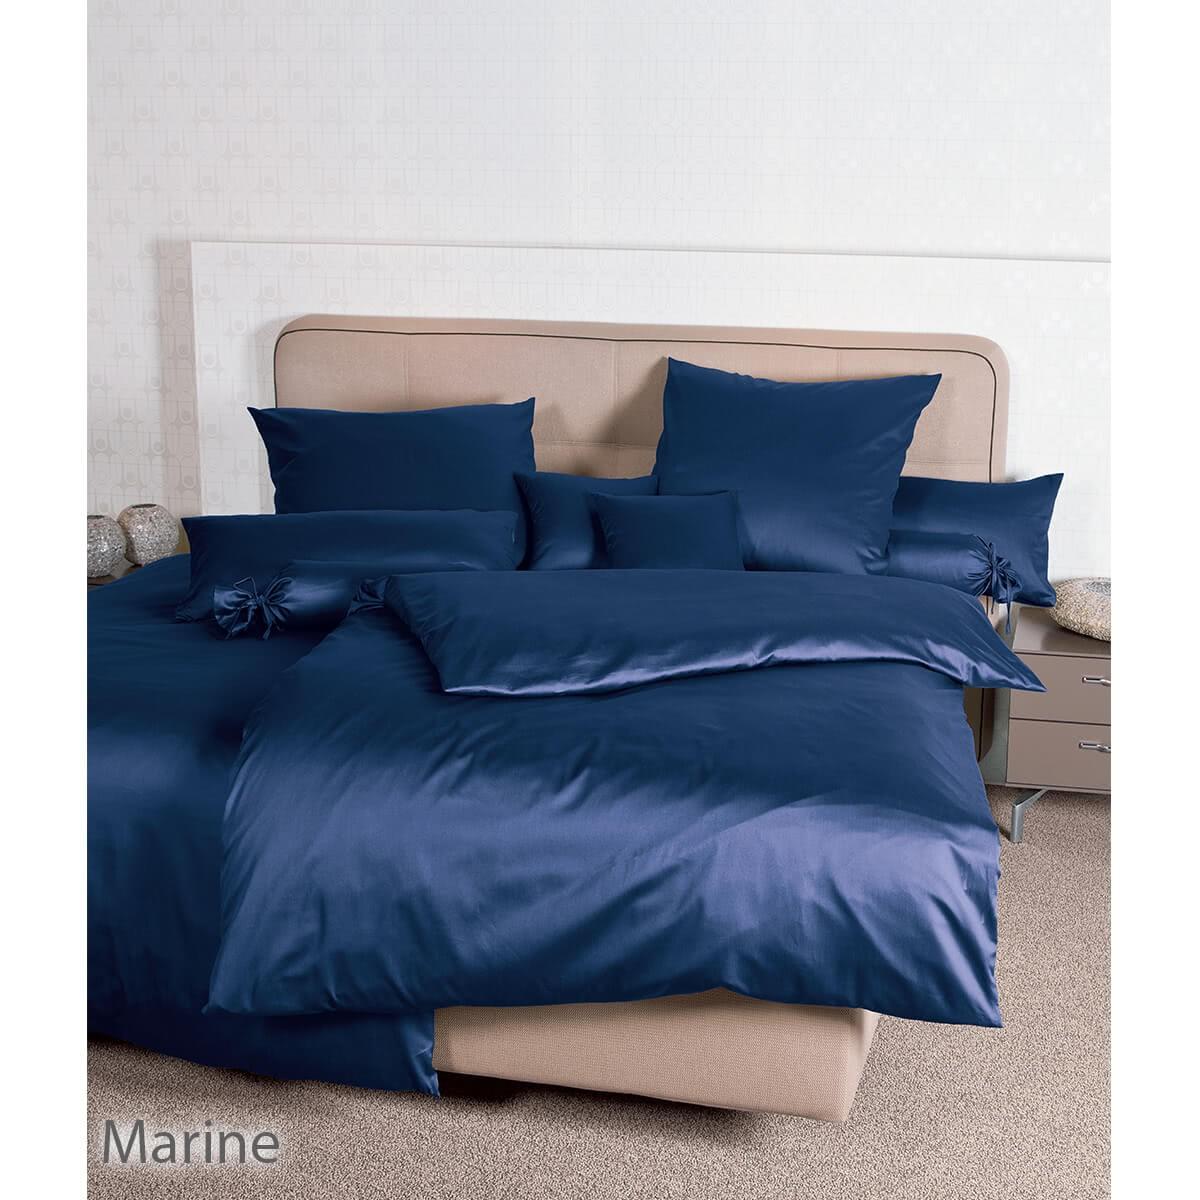 Janine Colors 31001 Bettwäsche - Marine Millieu